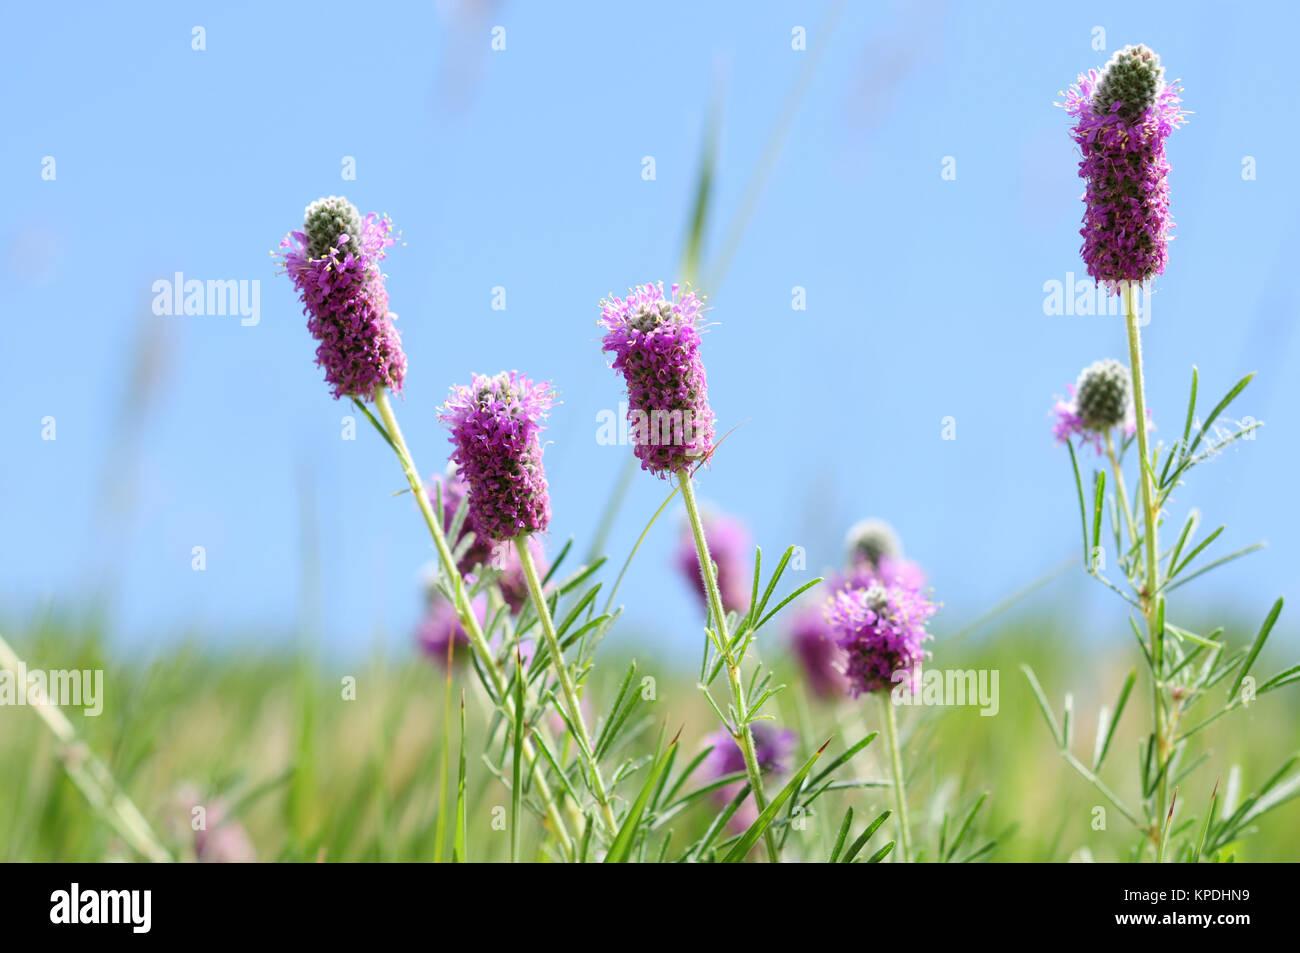 Flores Silvestres de Colorado - Flores de trébol violeta, pradera, Dalea purpurea. Foto de stock